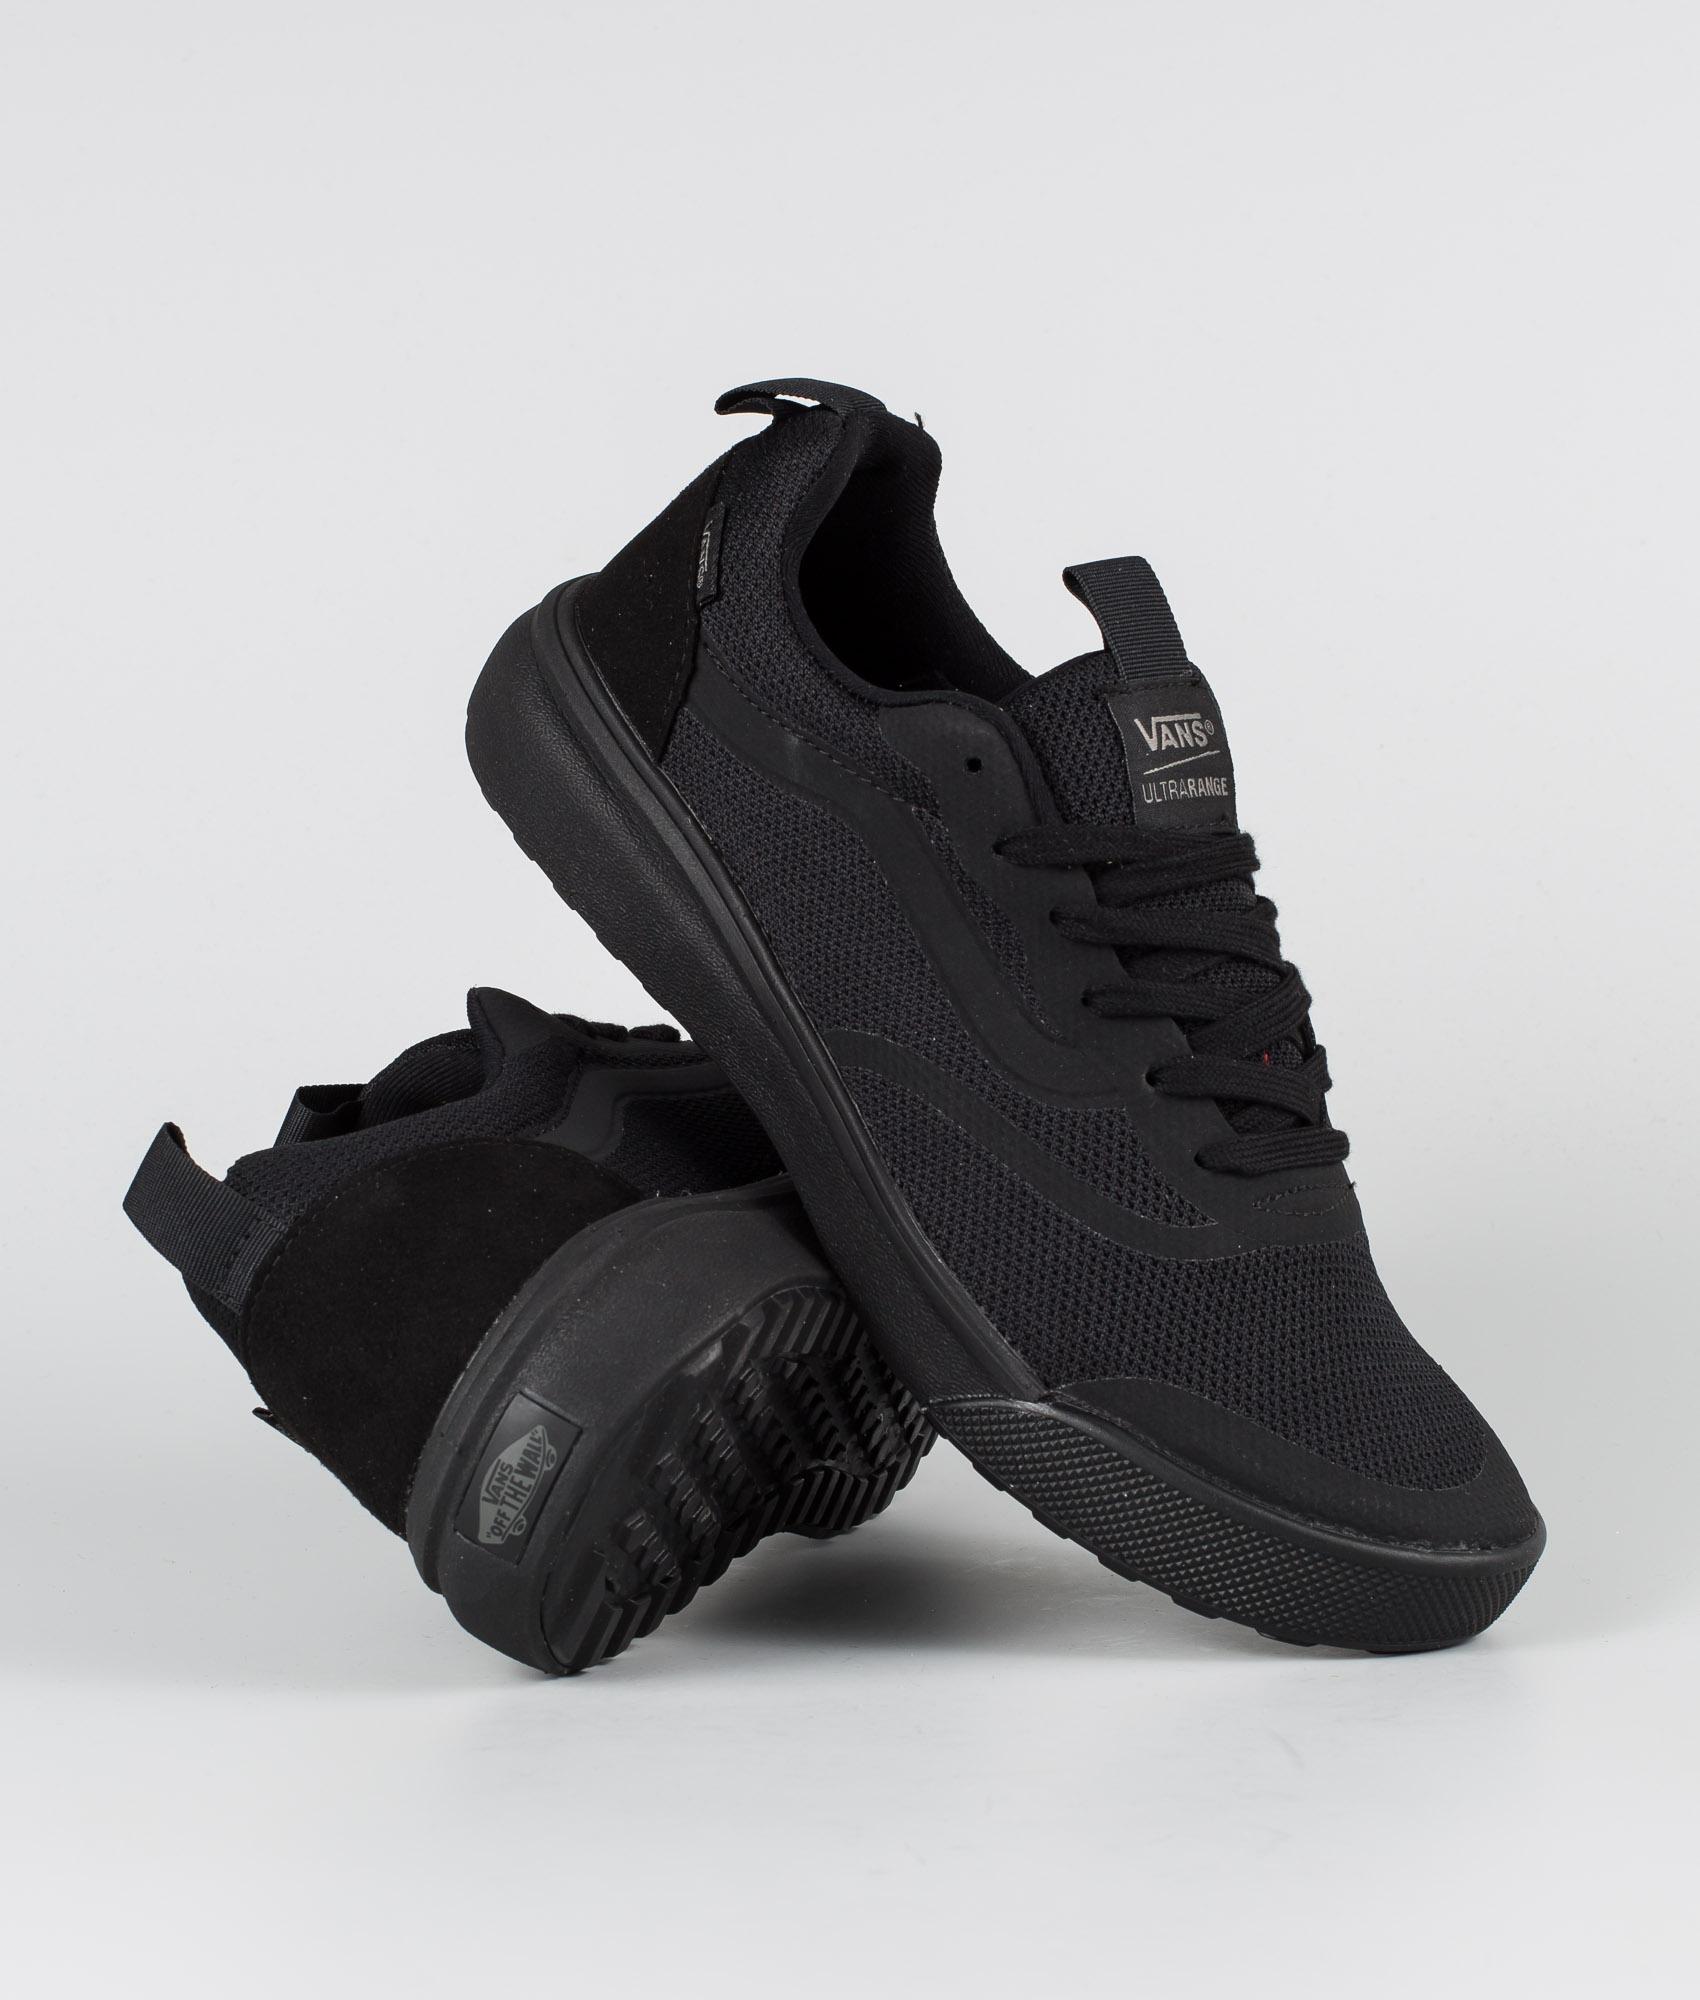 Vans UltraRange Rapidweld Shoes Black